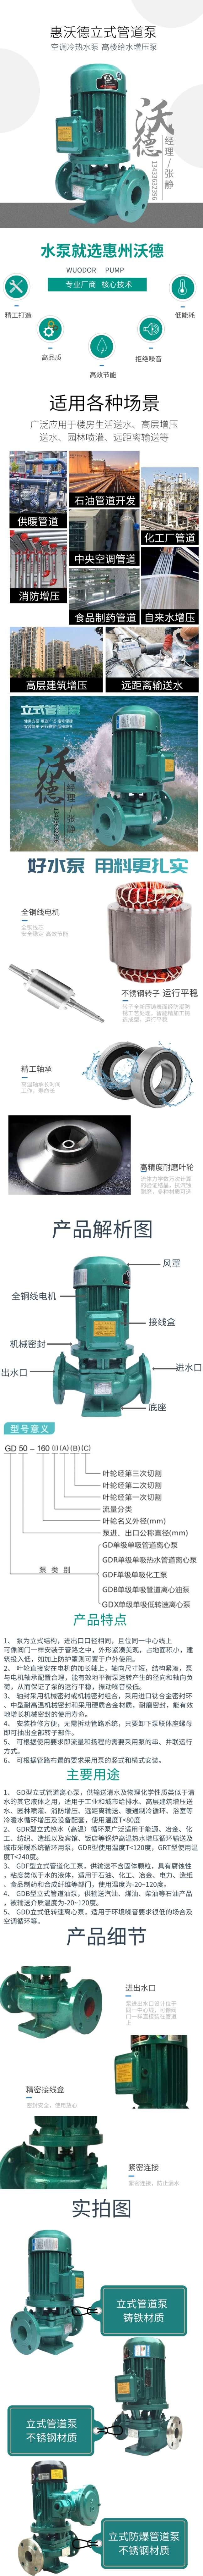 GD立式管道泵詳請-張靜@凡科快圖.jpg